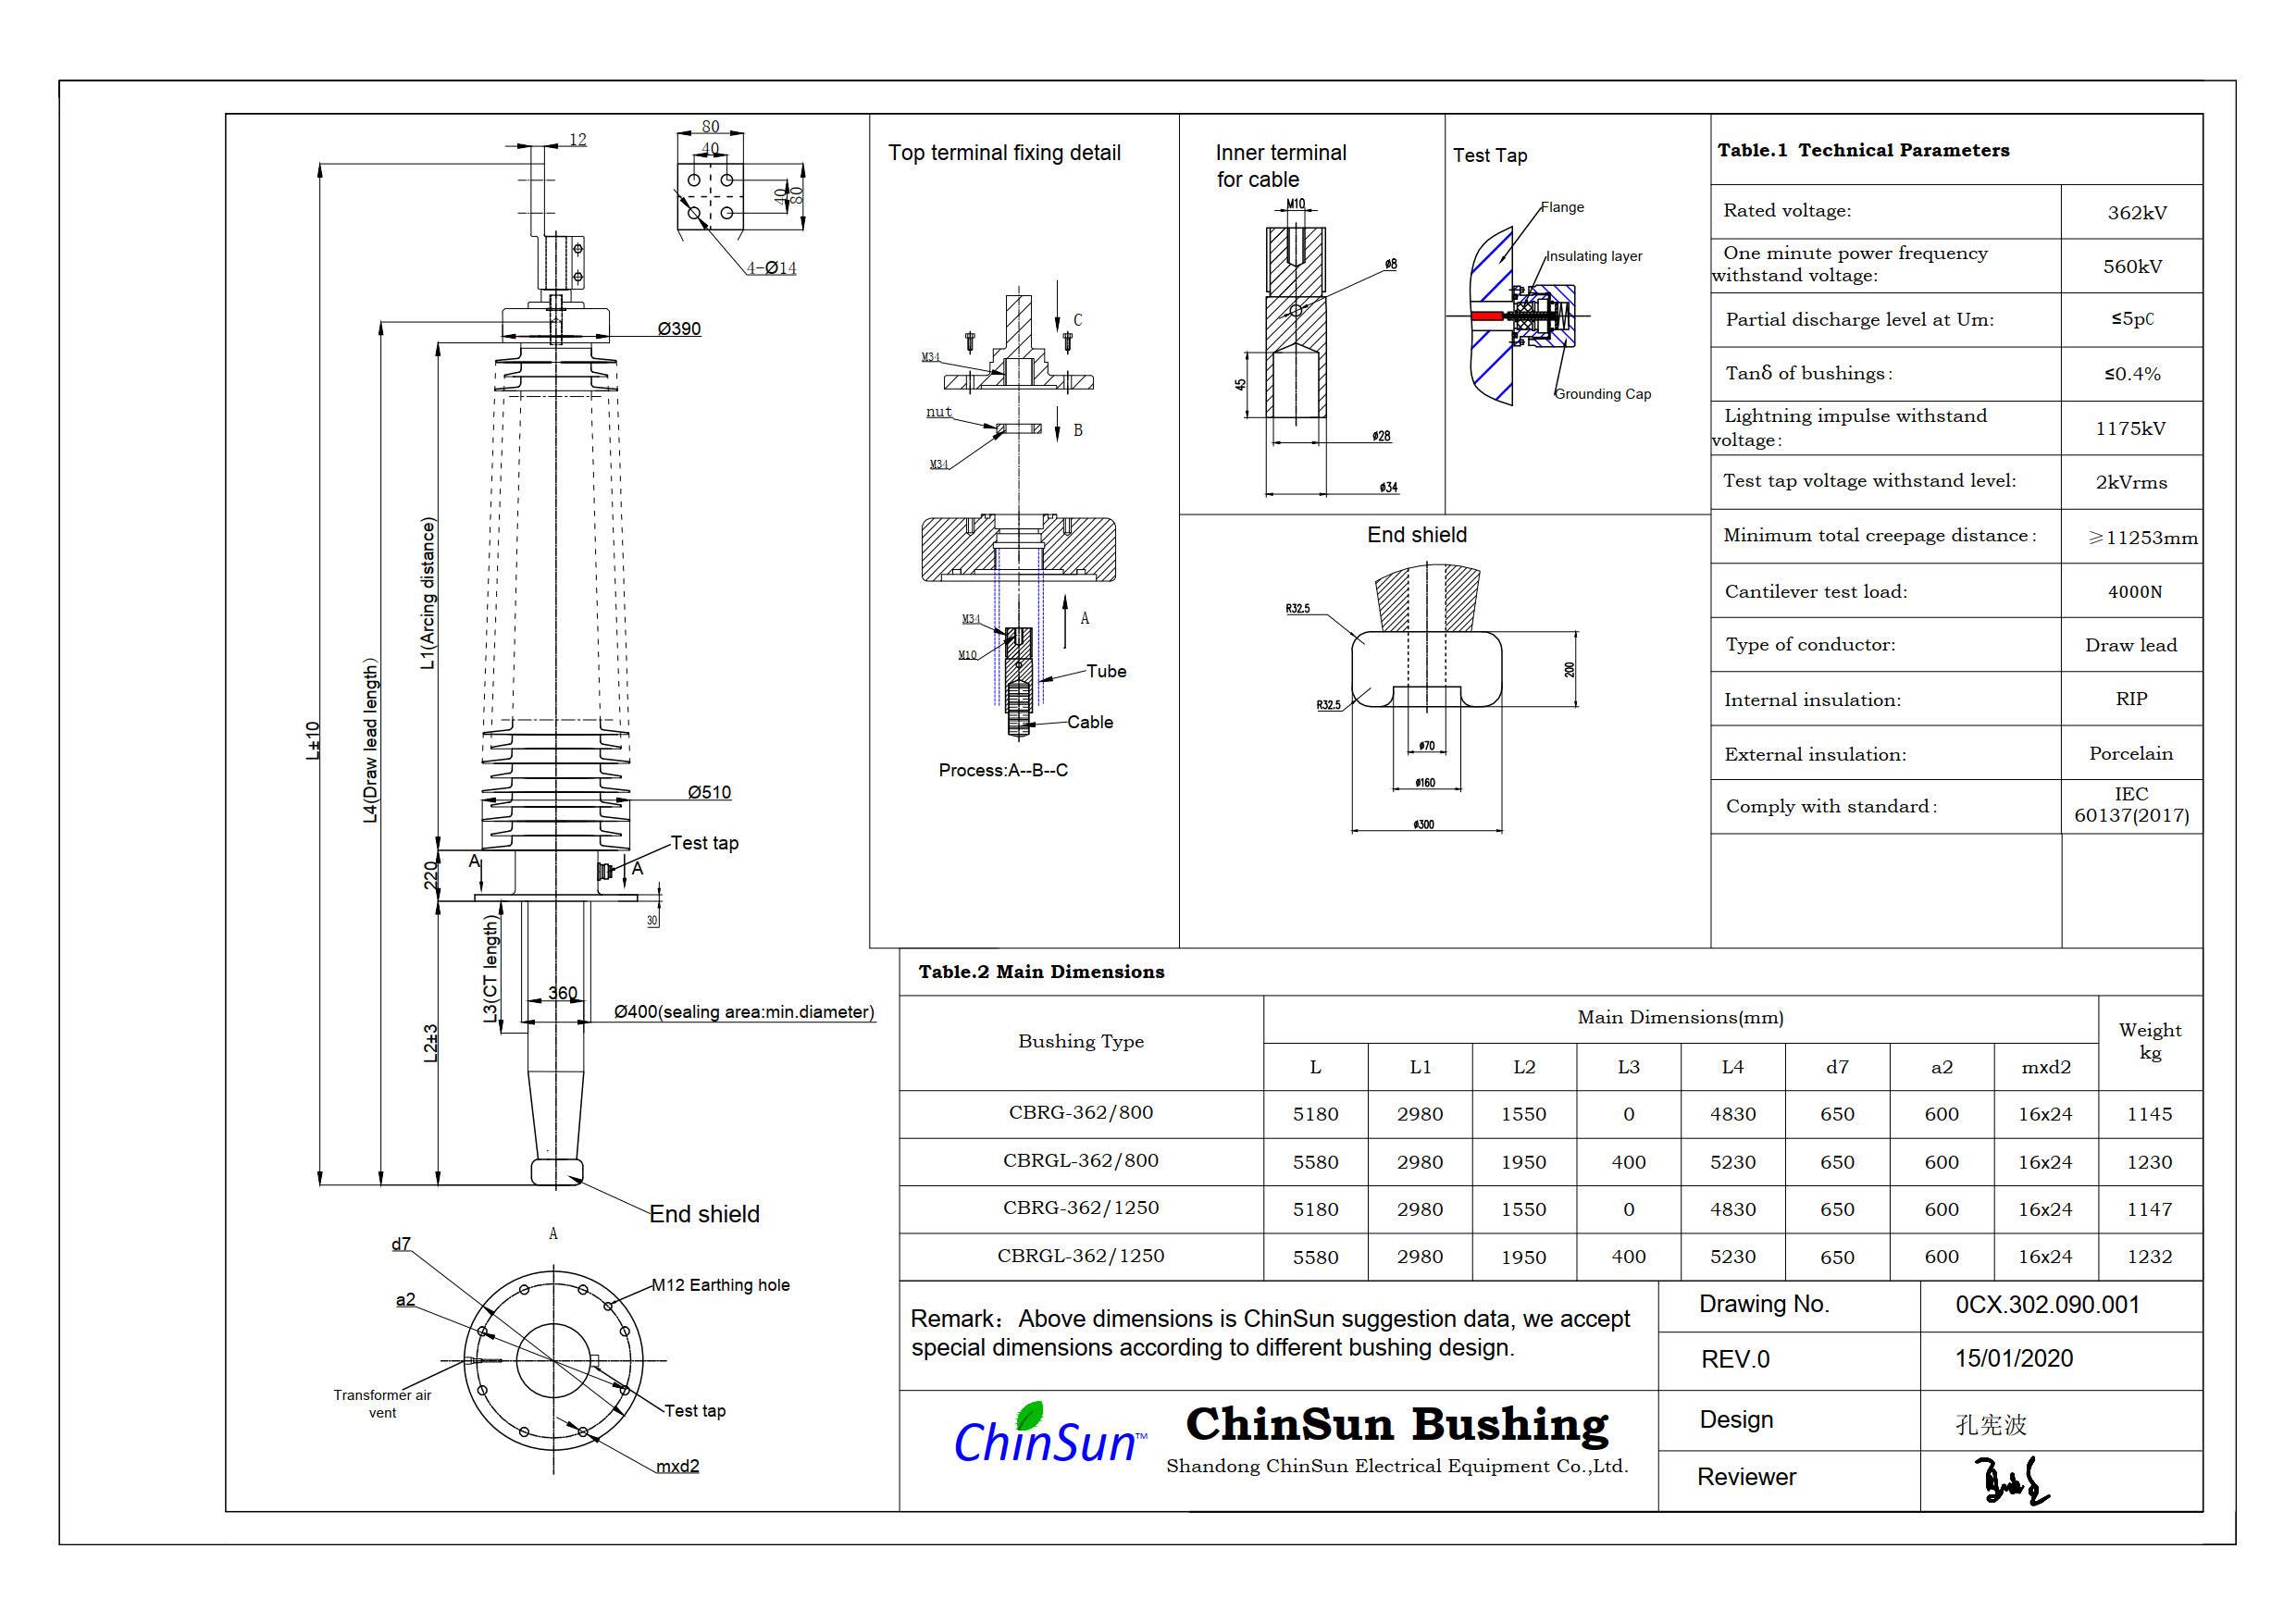 Drawing-transformer bushing-362kV_porcelain-DL-ChinSun